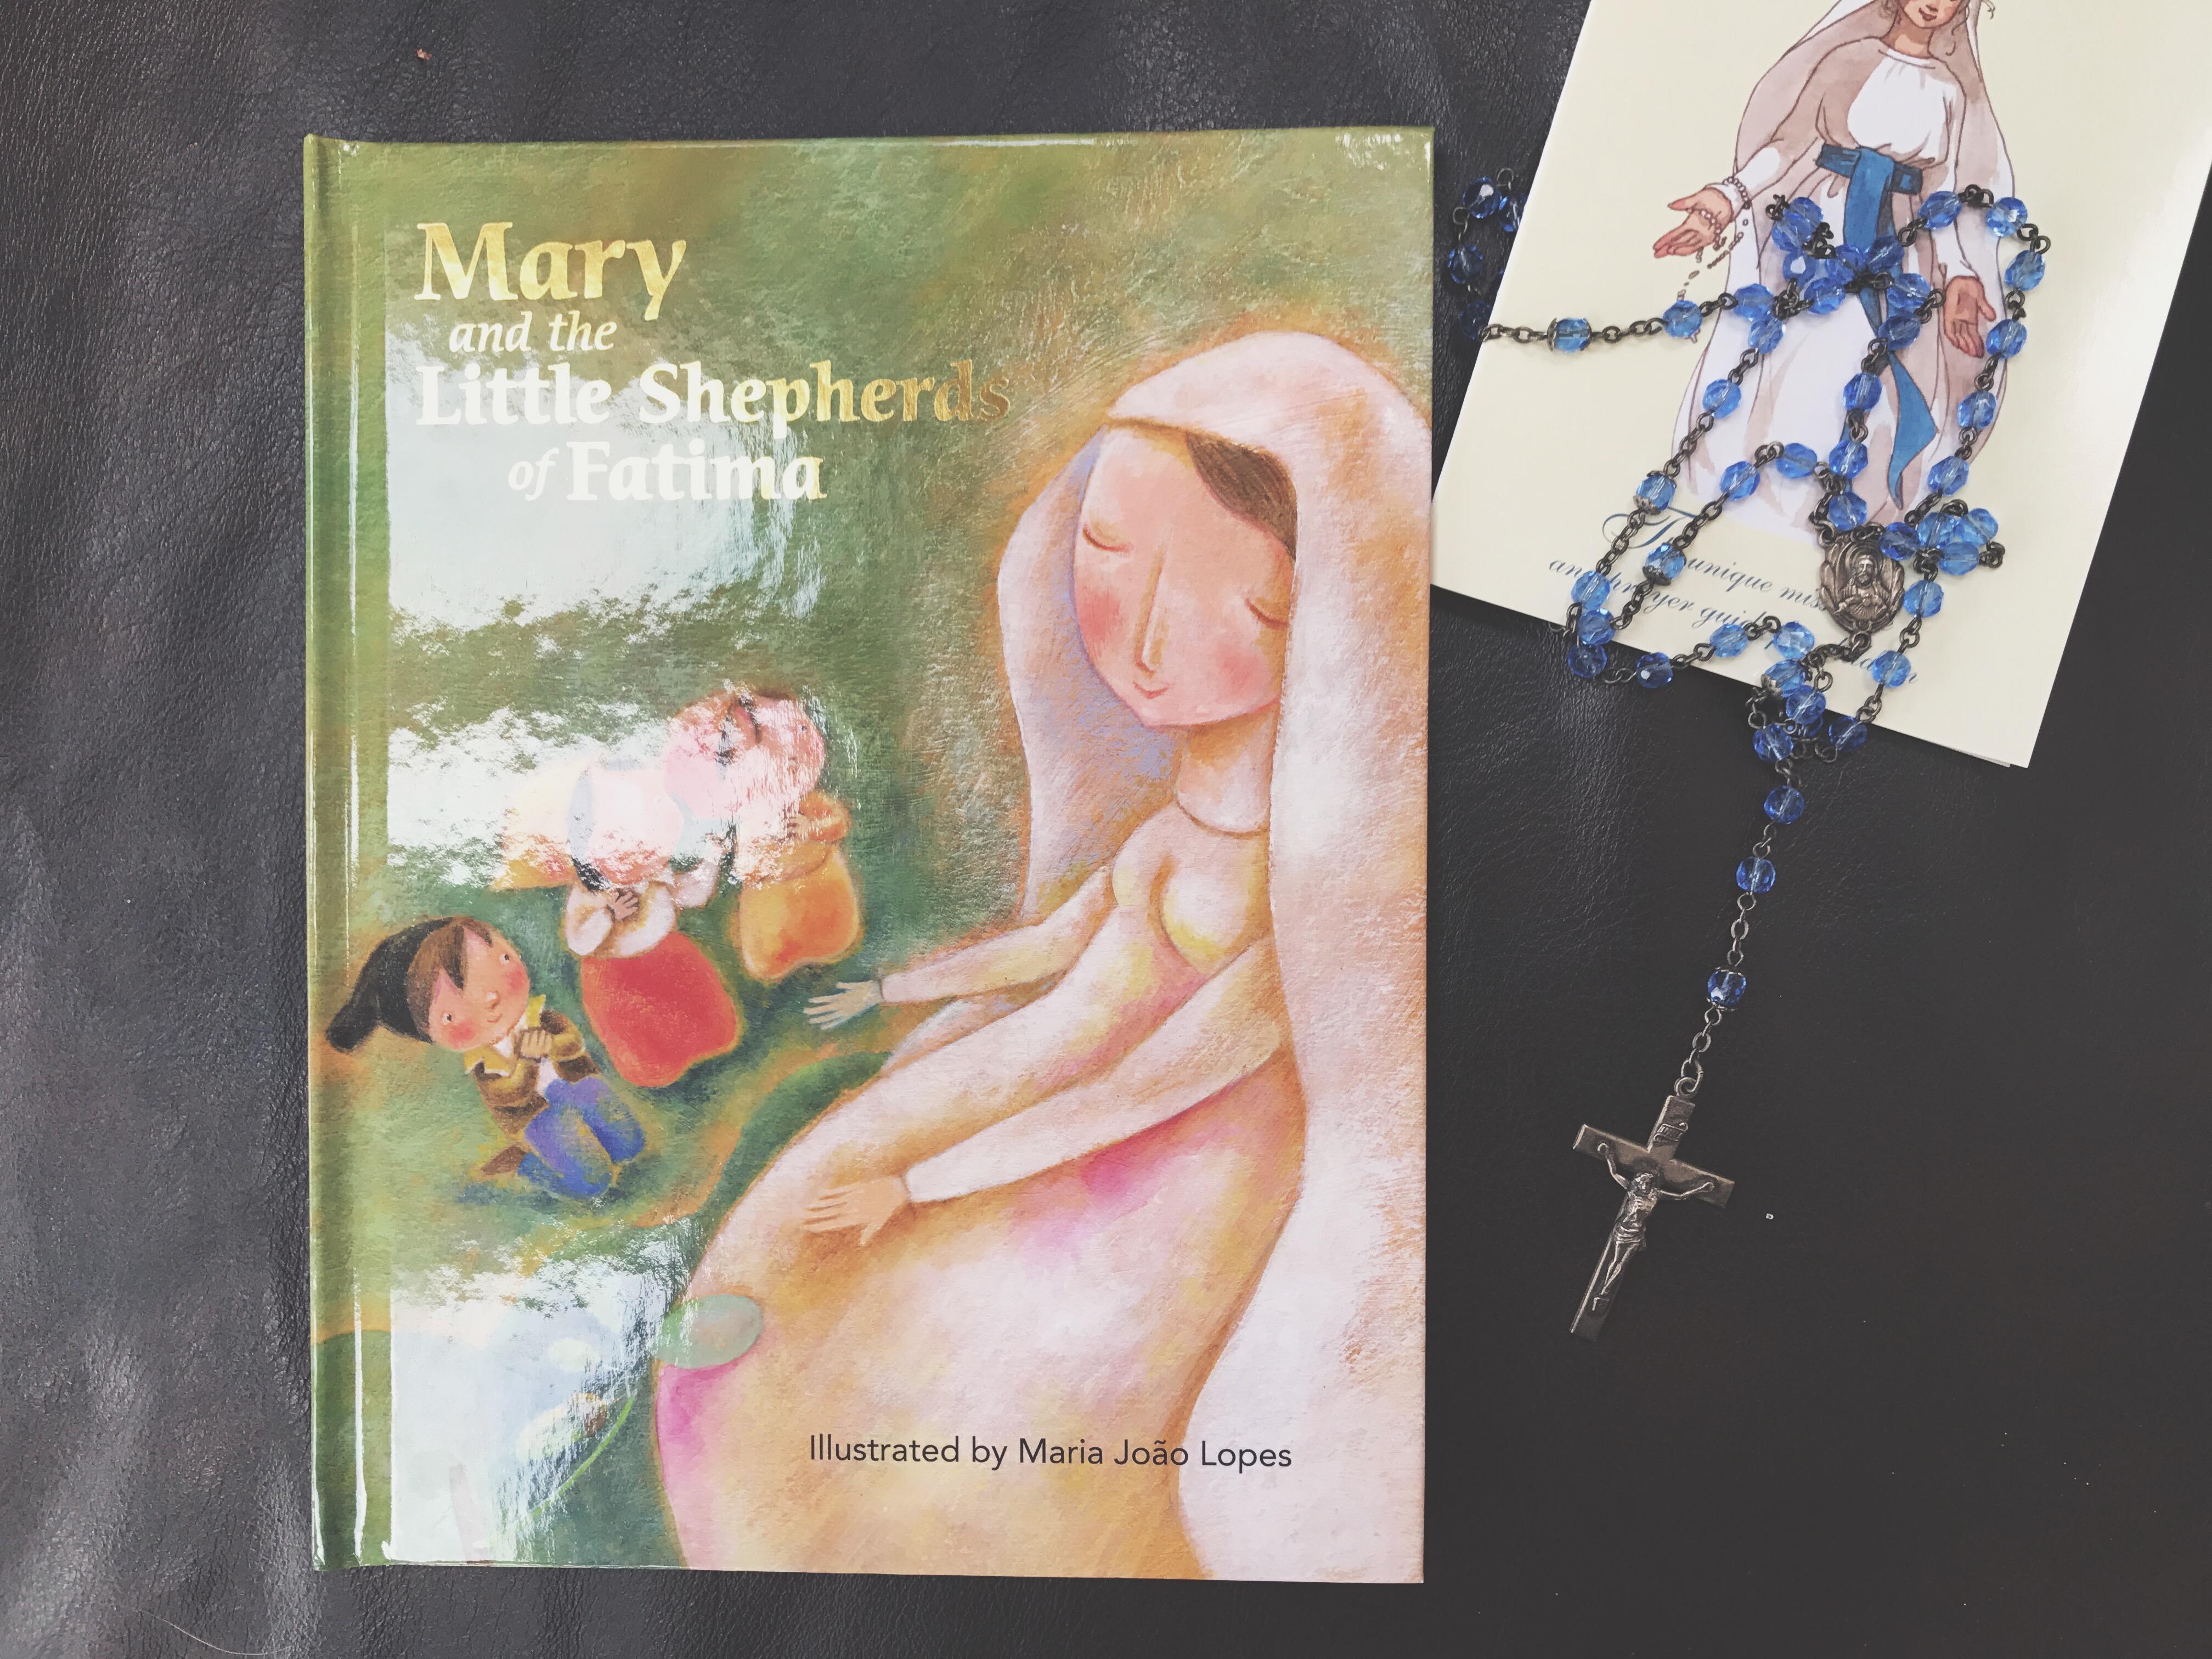 Catholic children's book on Fatima